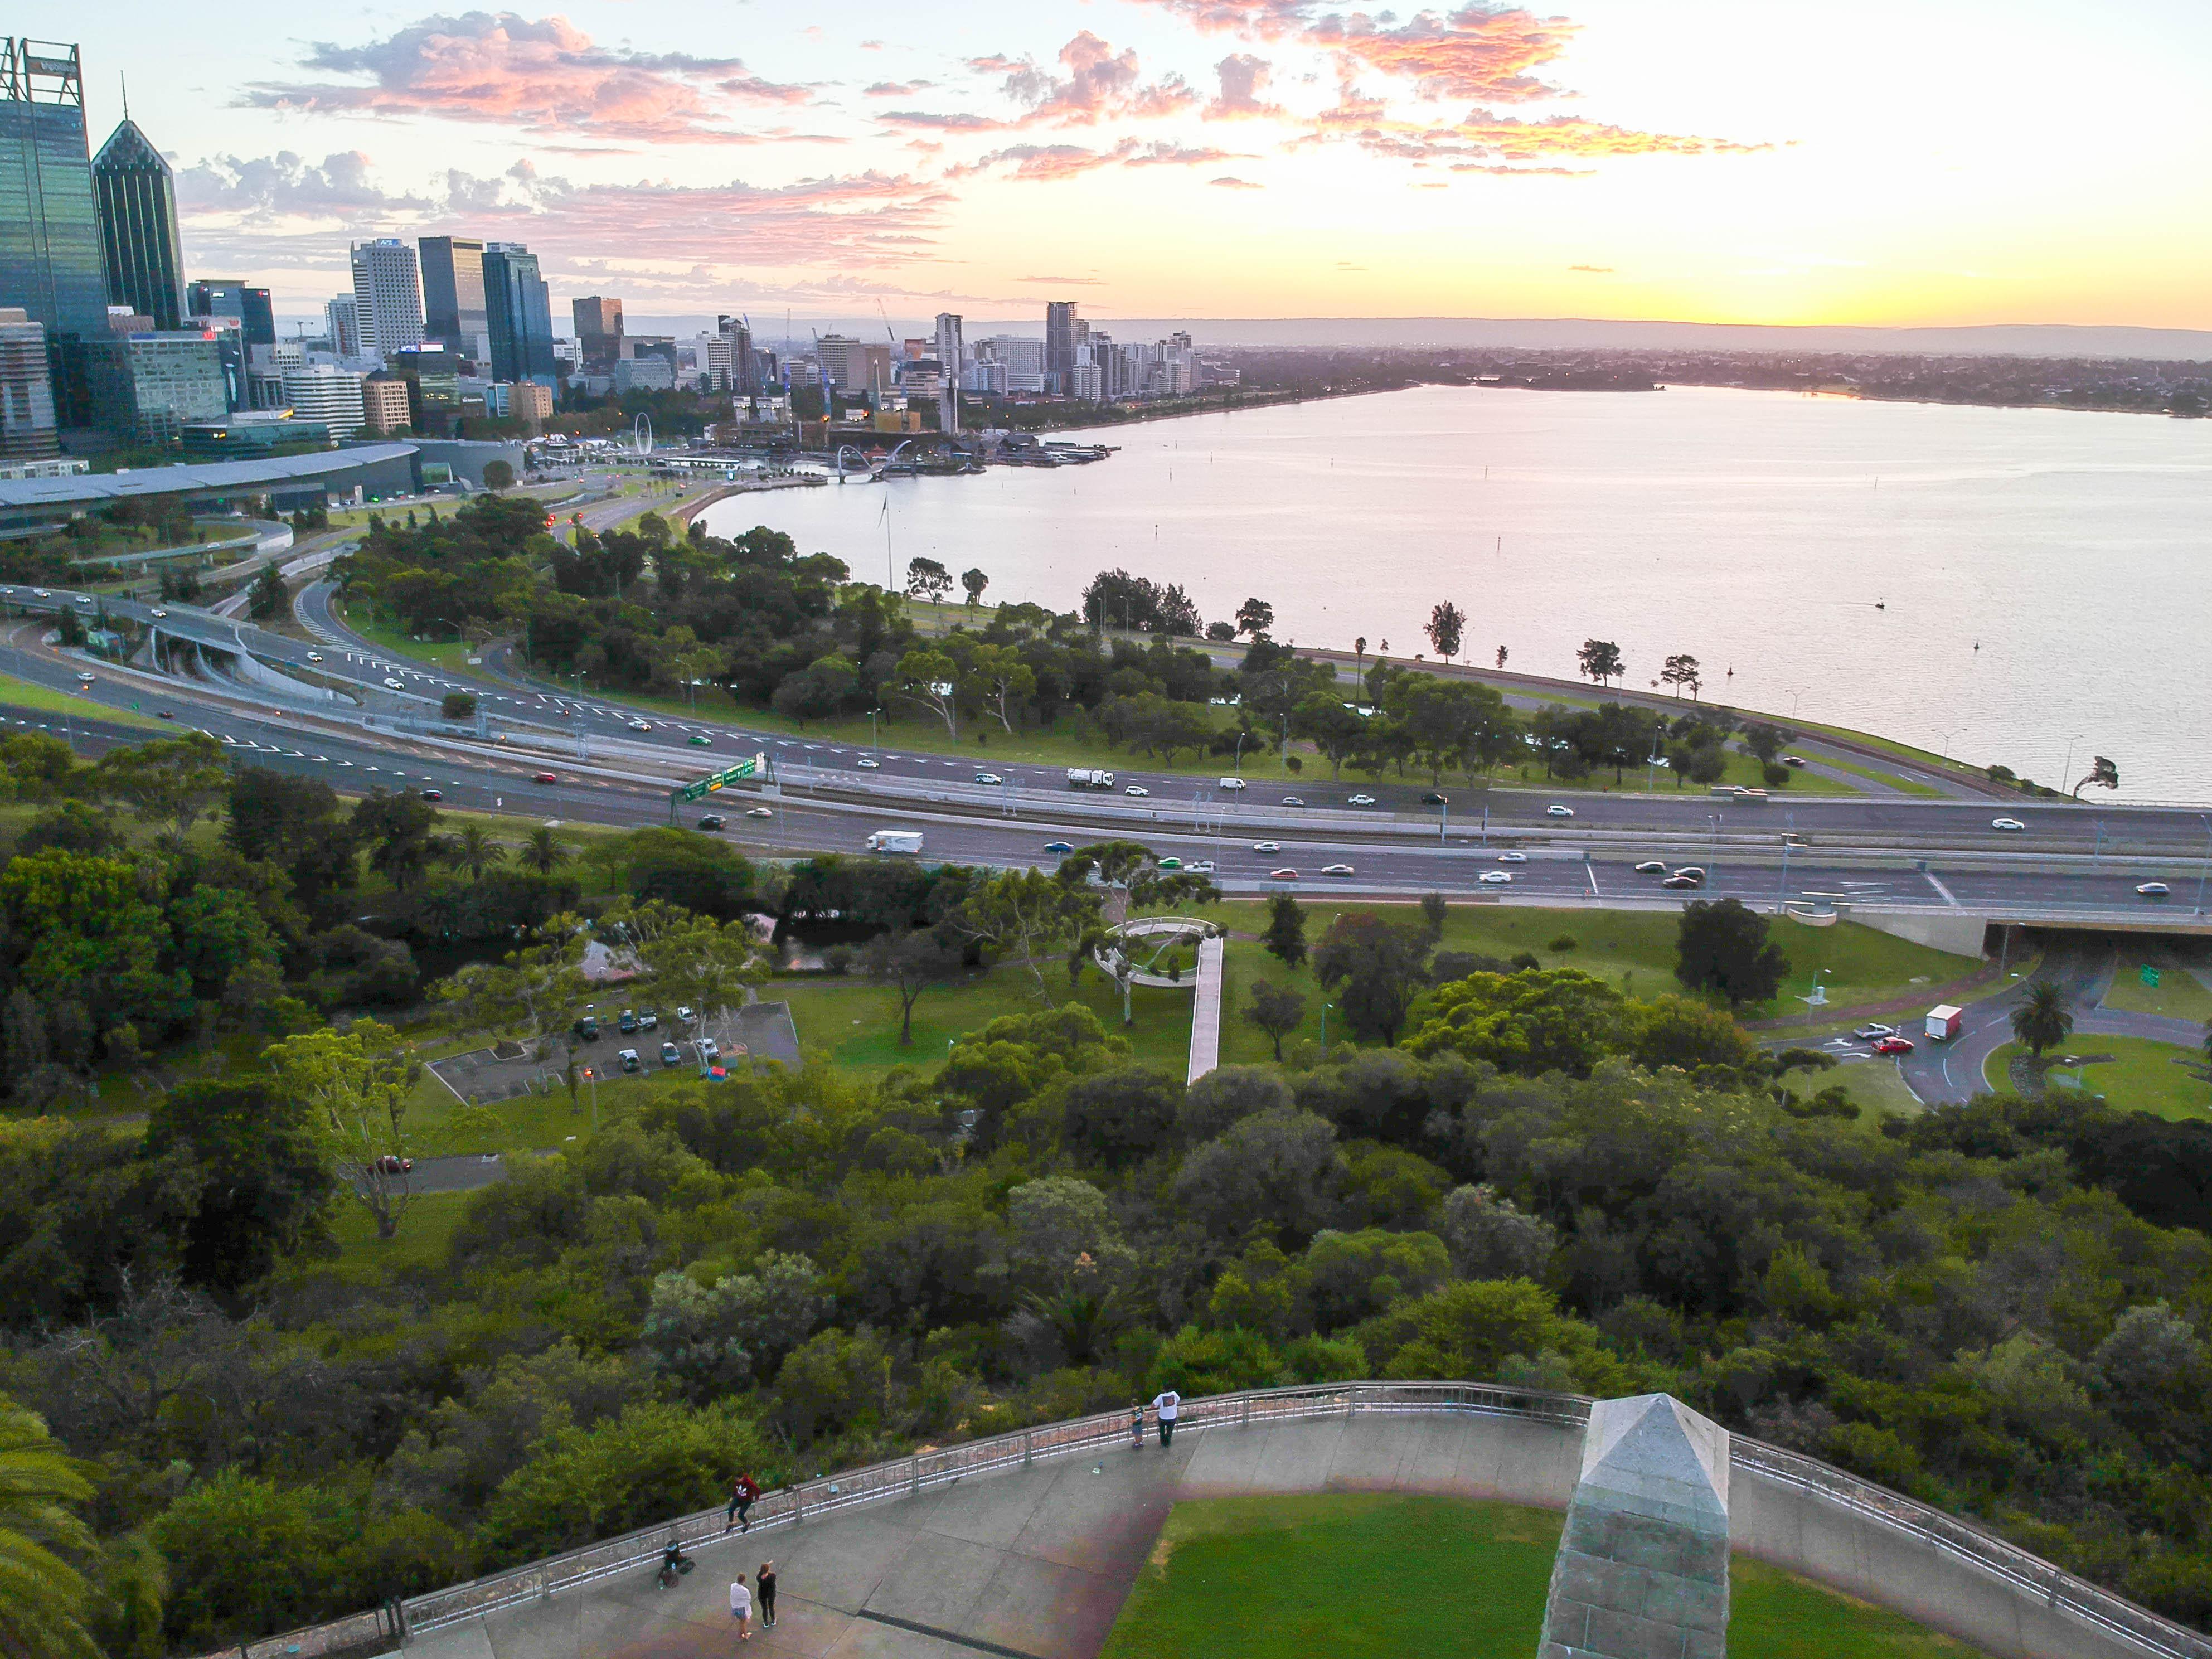 DJI Spark Perth Skyline